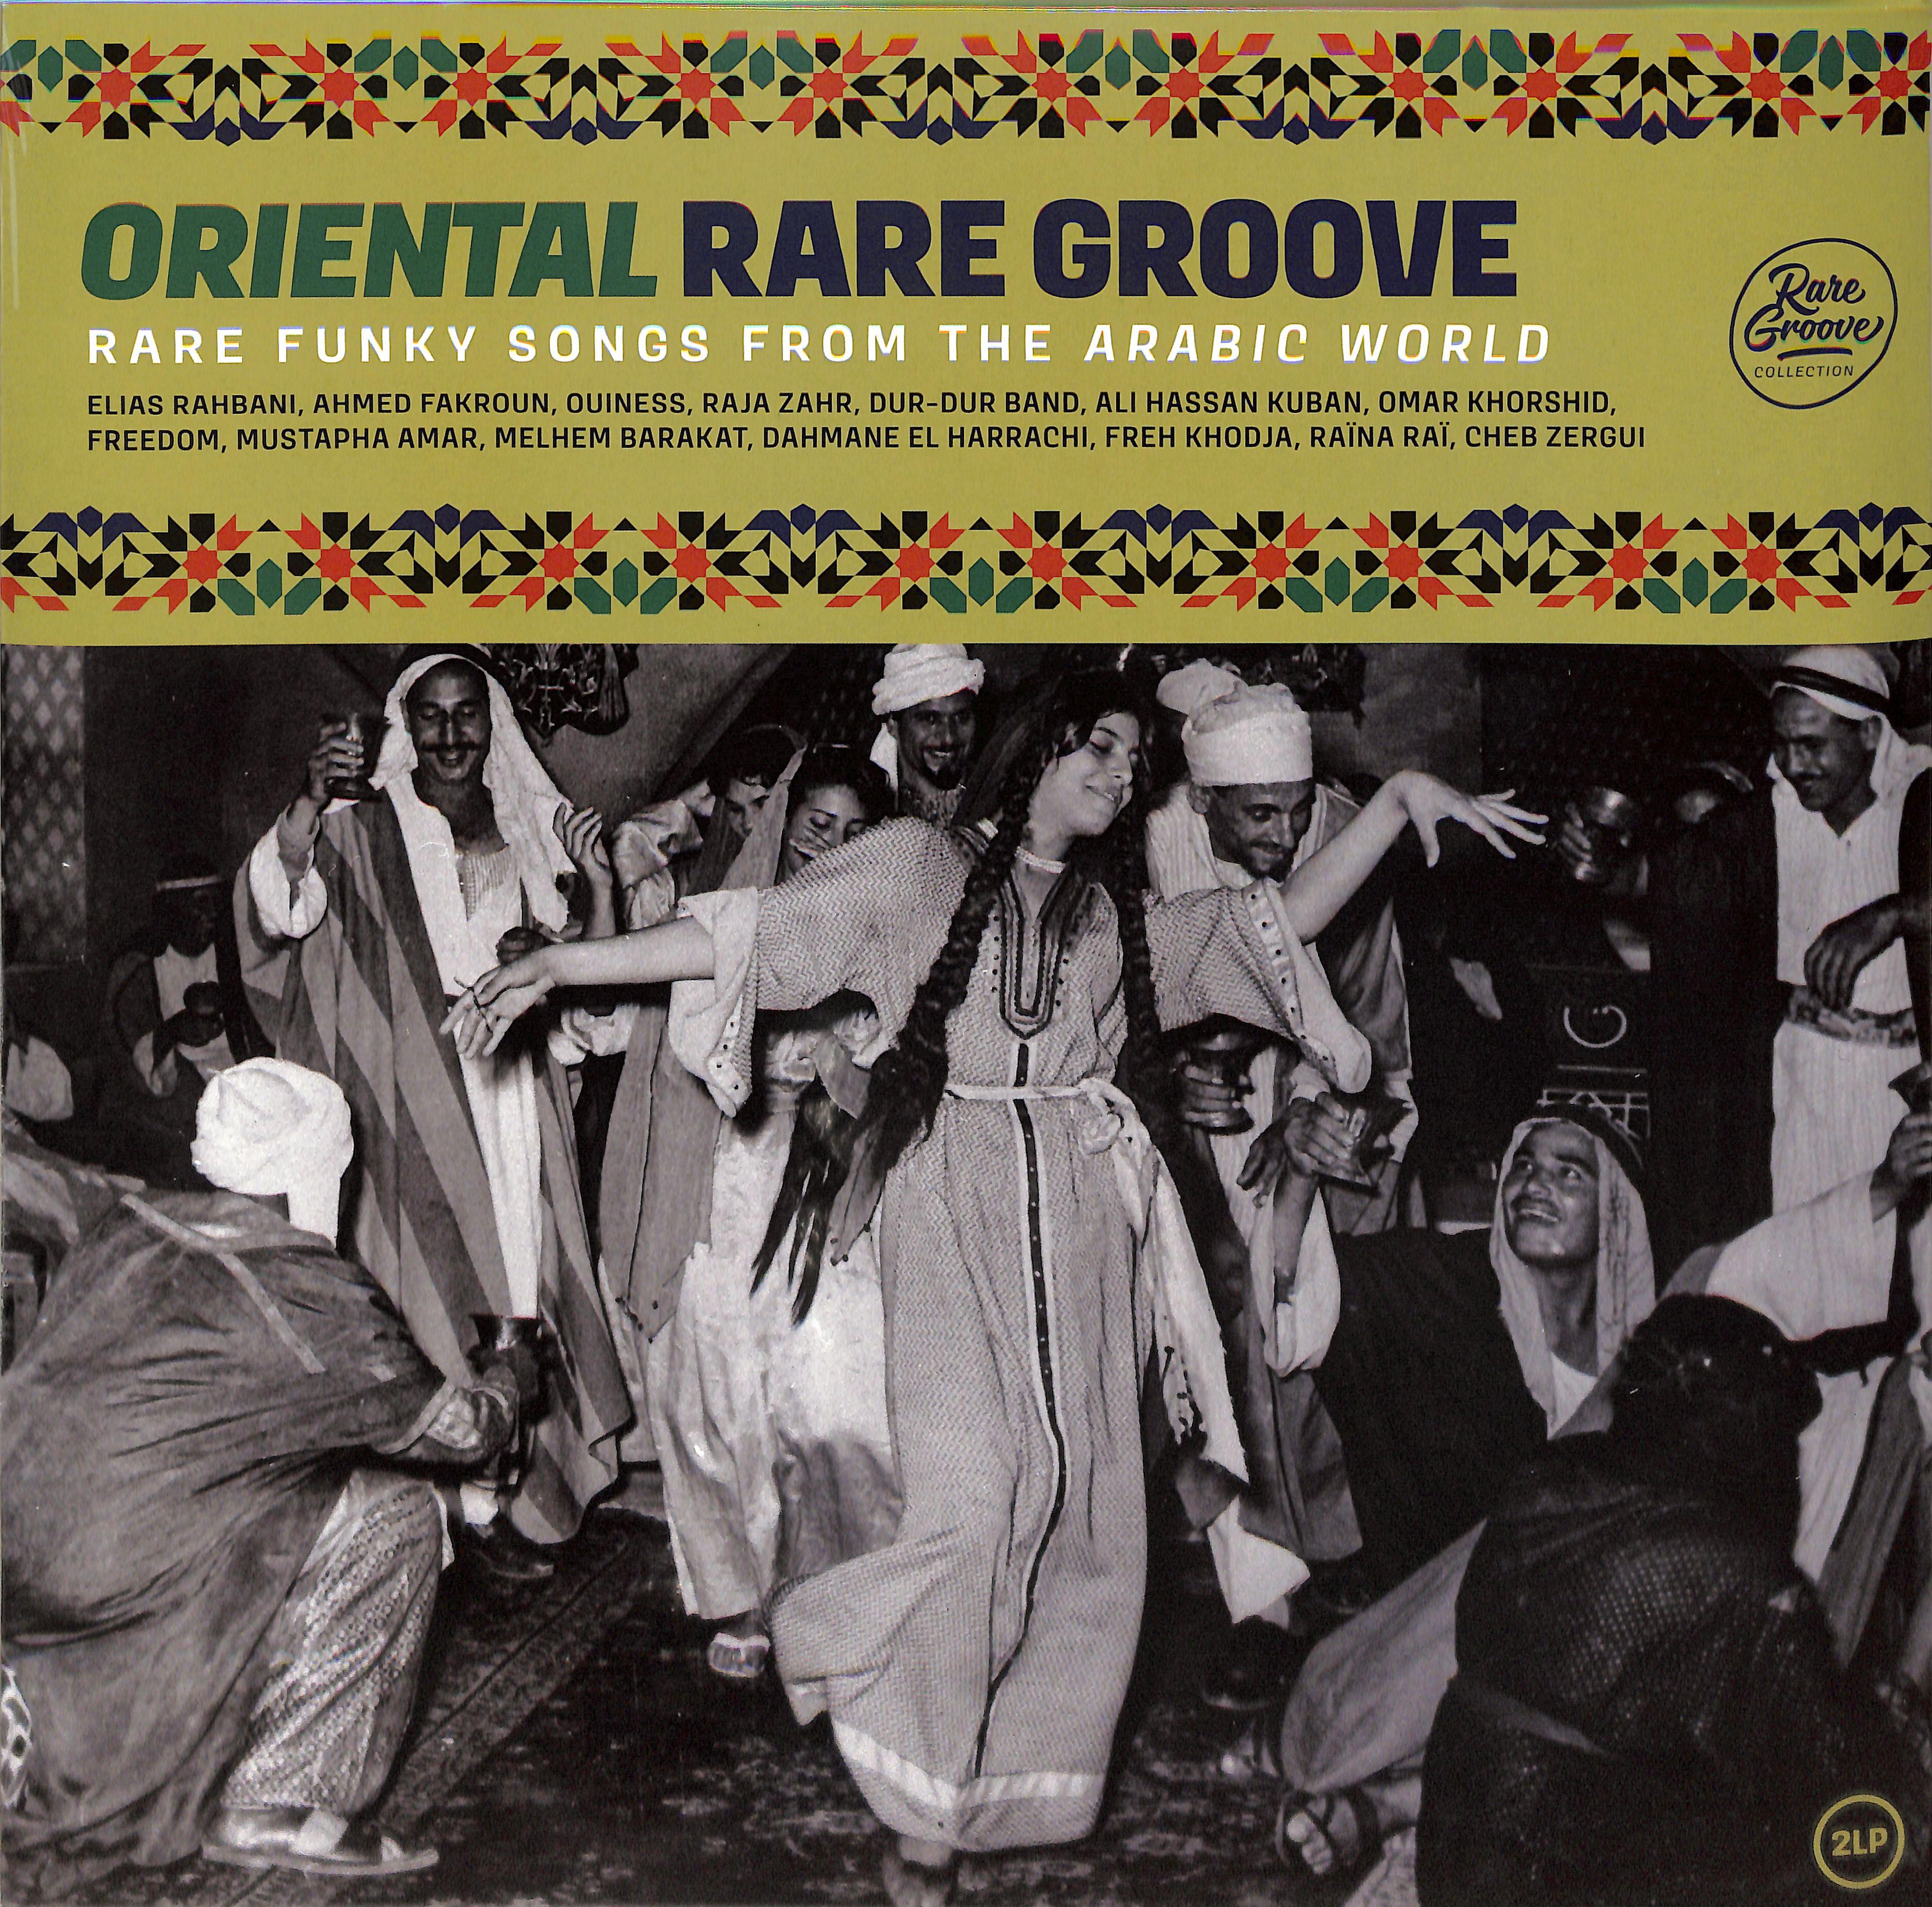 Various Artists - ORIENTAL RARE GROOVE